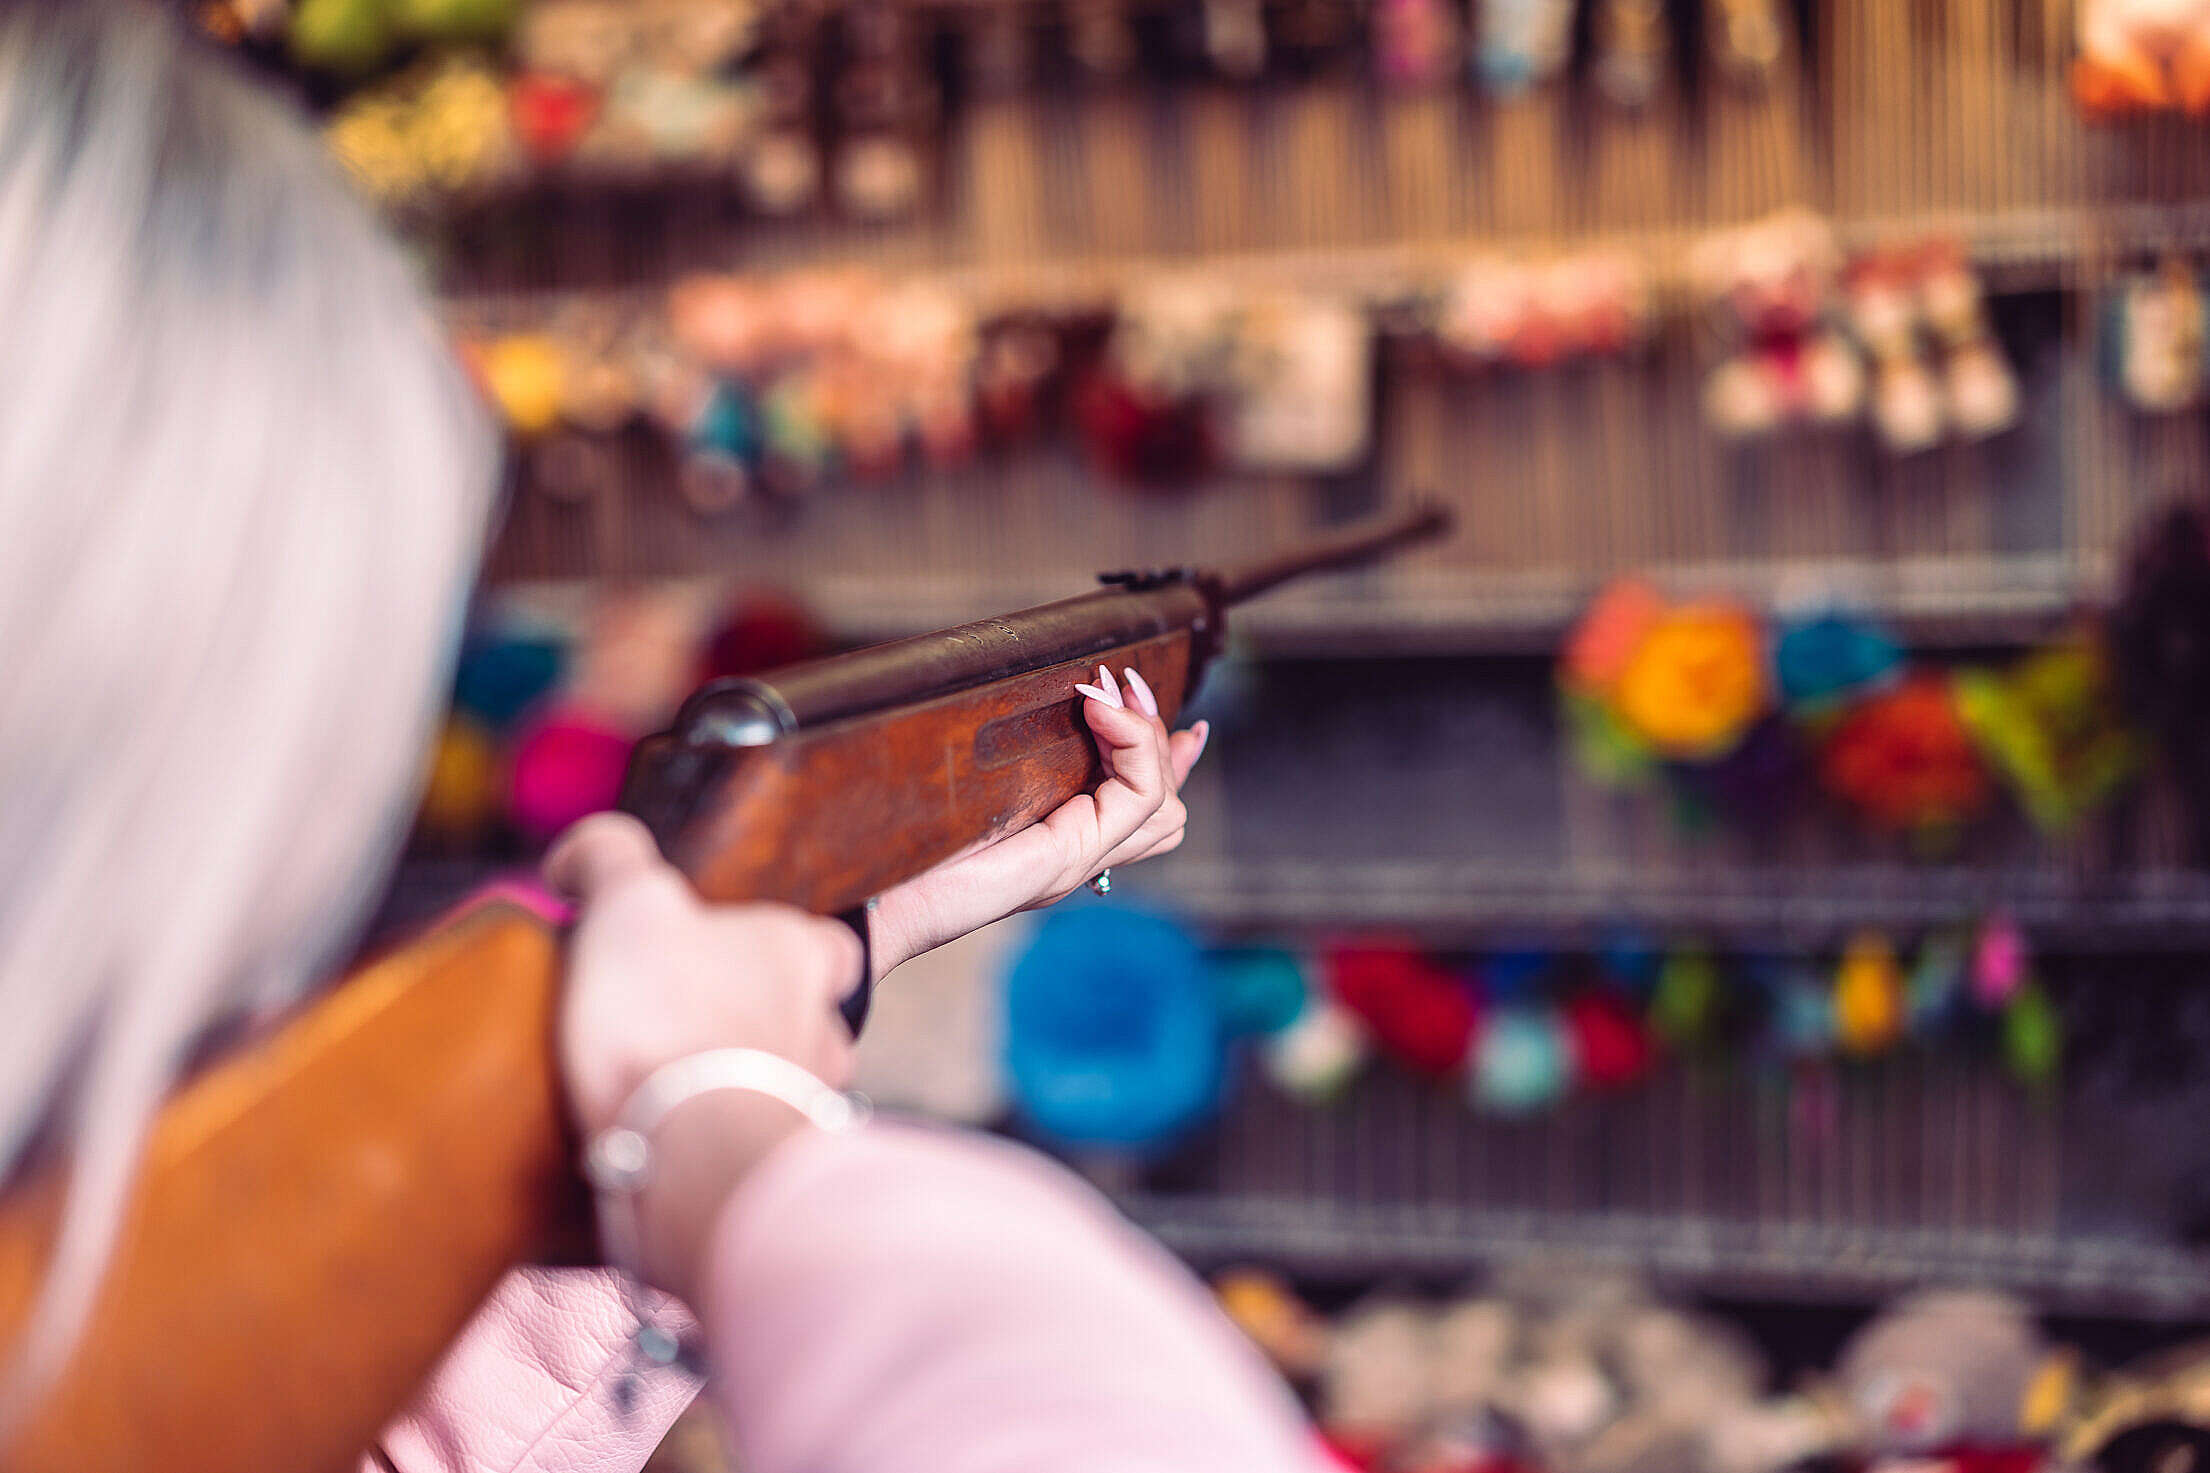 Woman with Rifle at Fun Fair Shooting Range Free Stock Photo